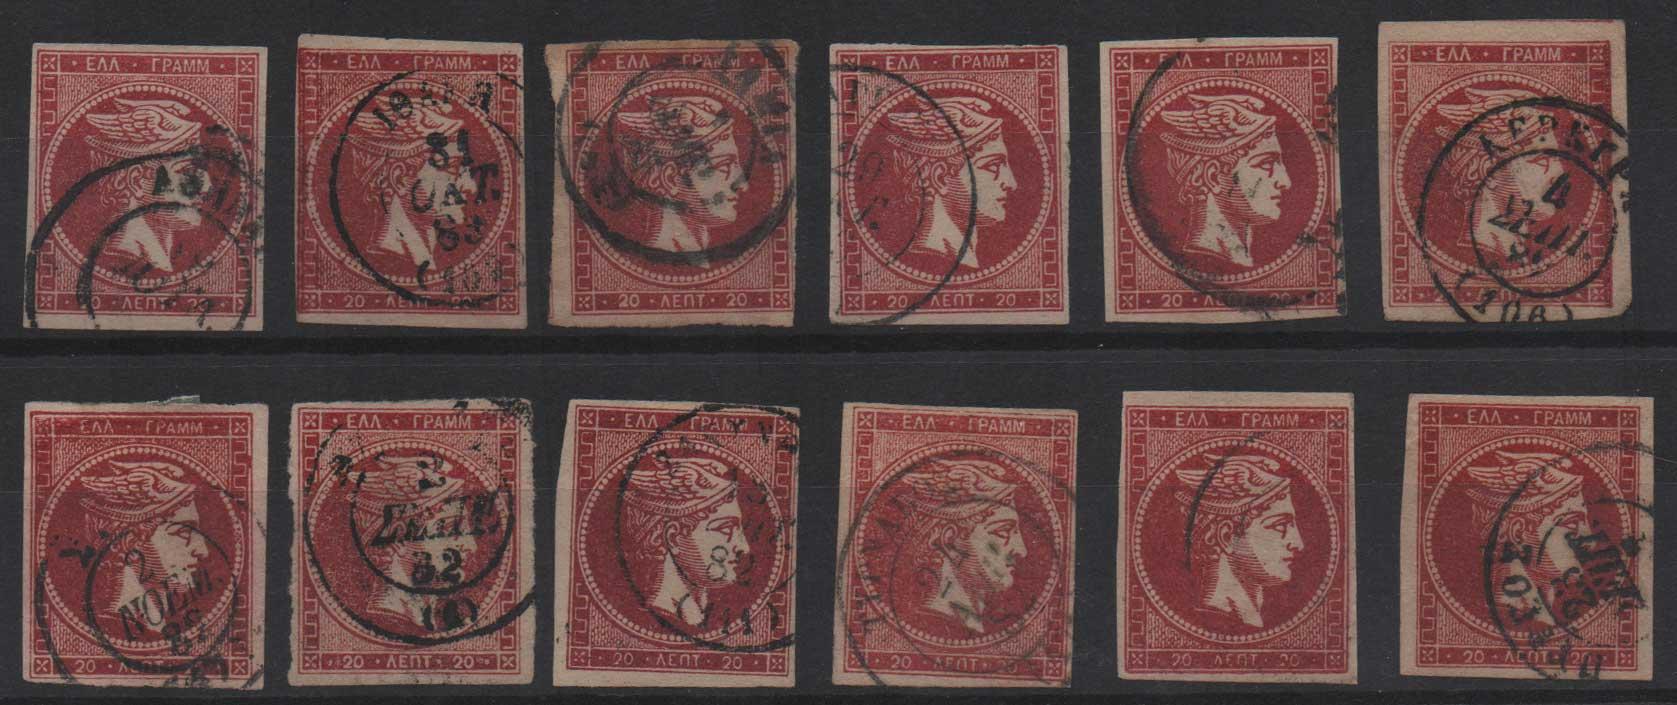 Lot 19 - -  LARGE HERMES HEAD large hermes head -  Athens Auctions Public Auction 70 General Stamp Sale